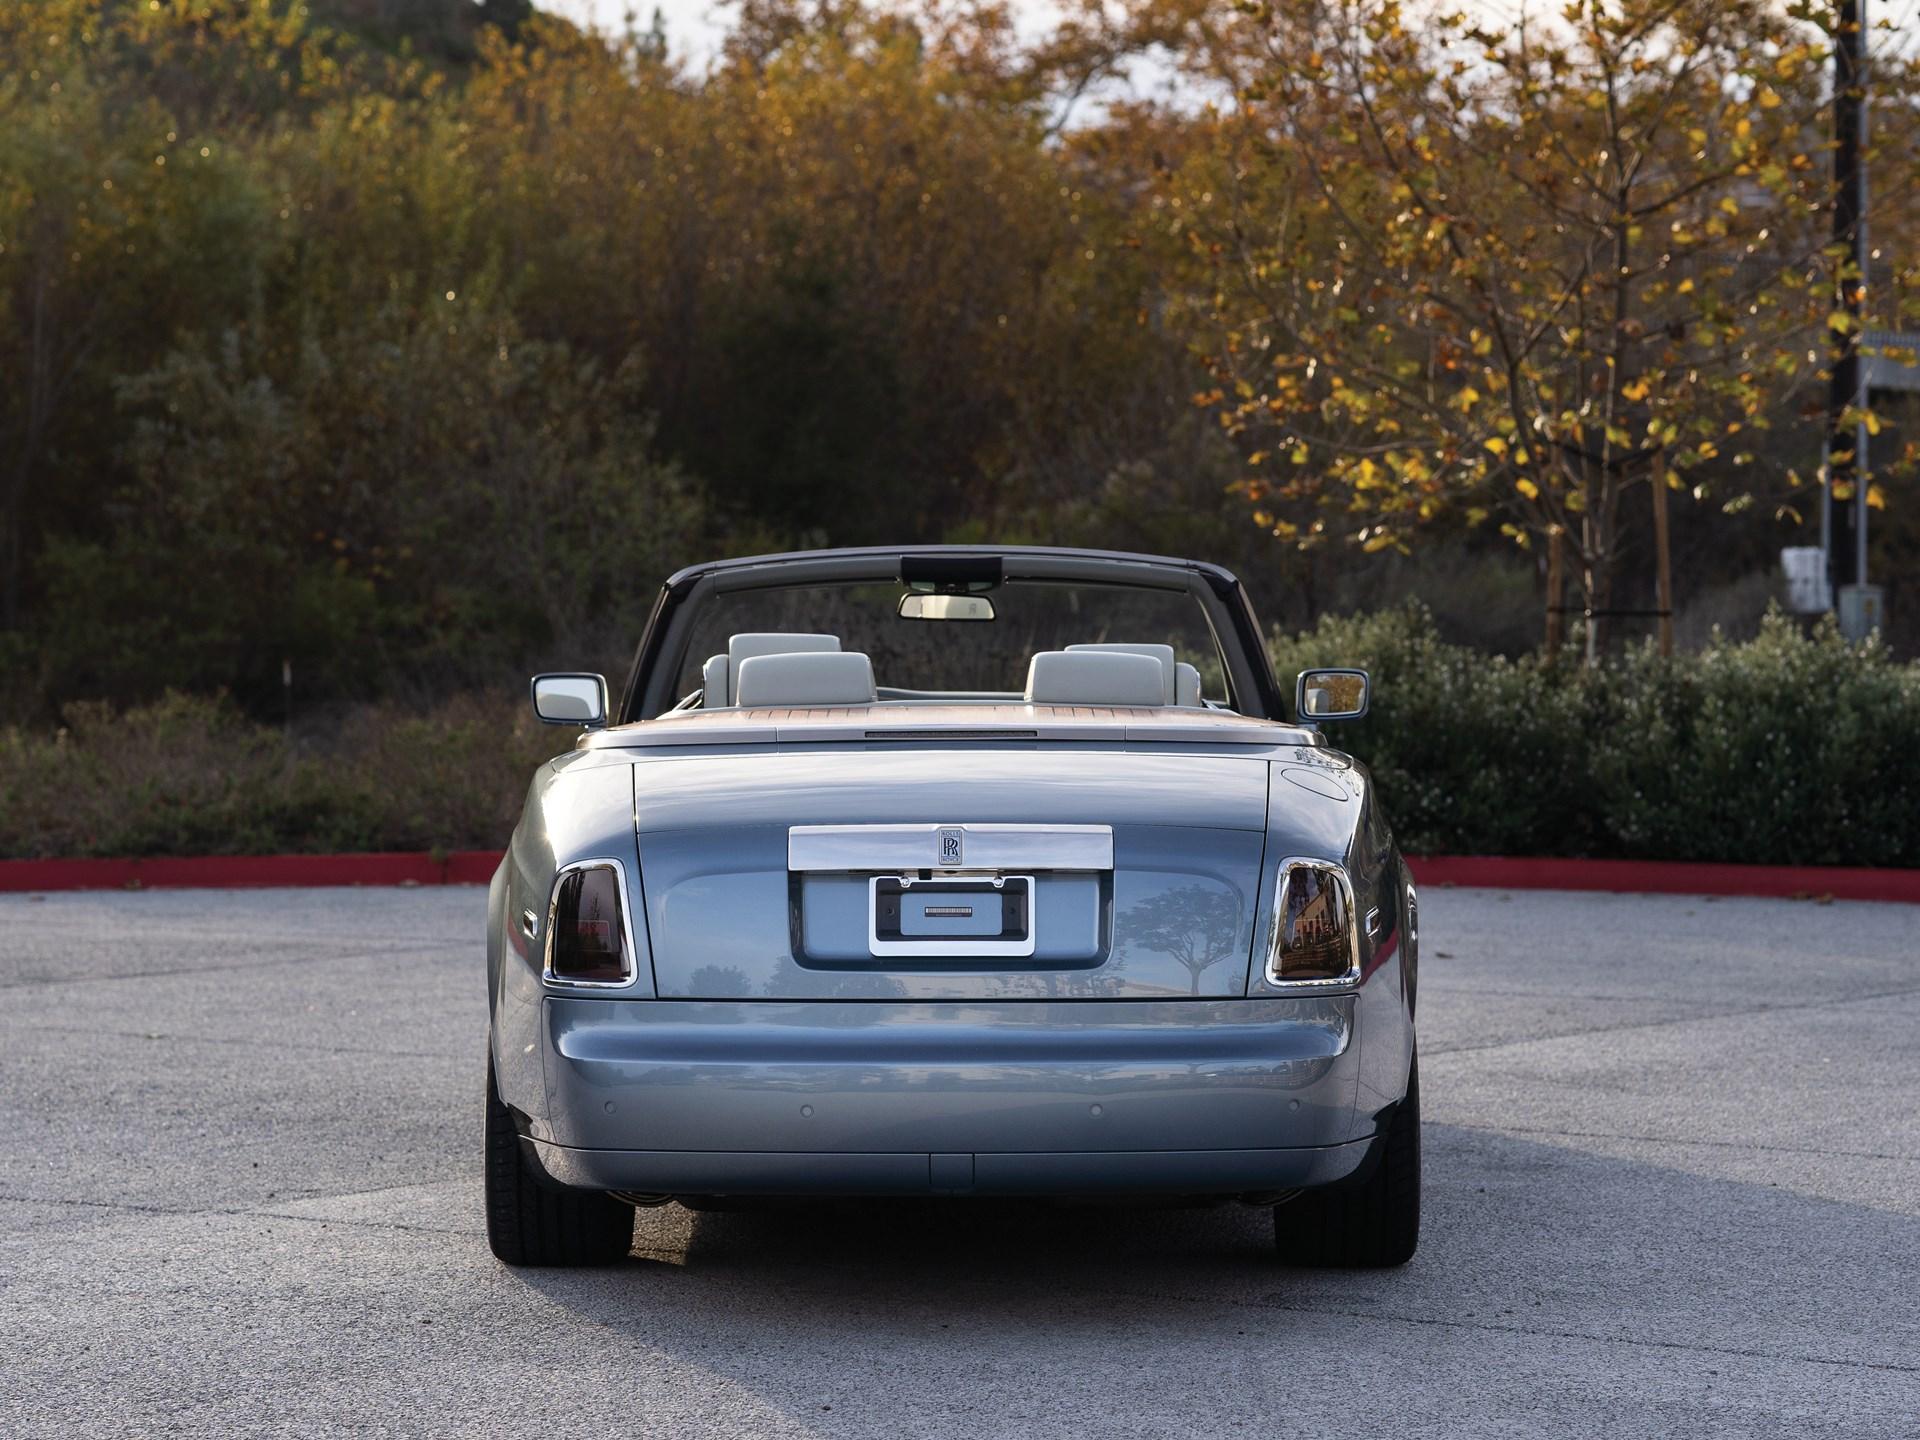 2009 Rolls Royce Phantom Drophead Coupe